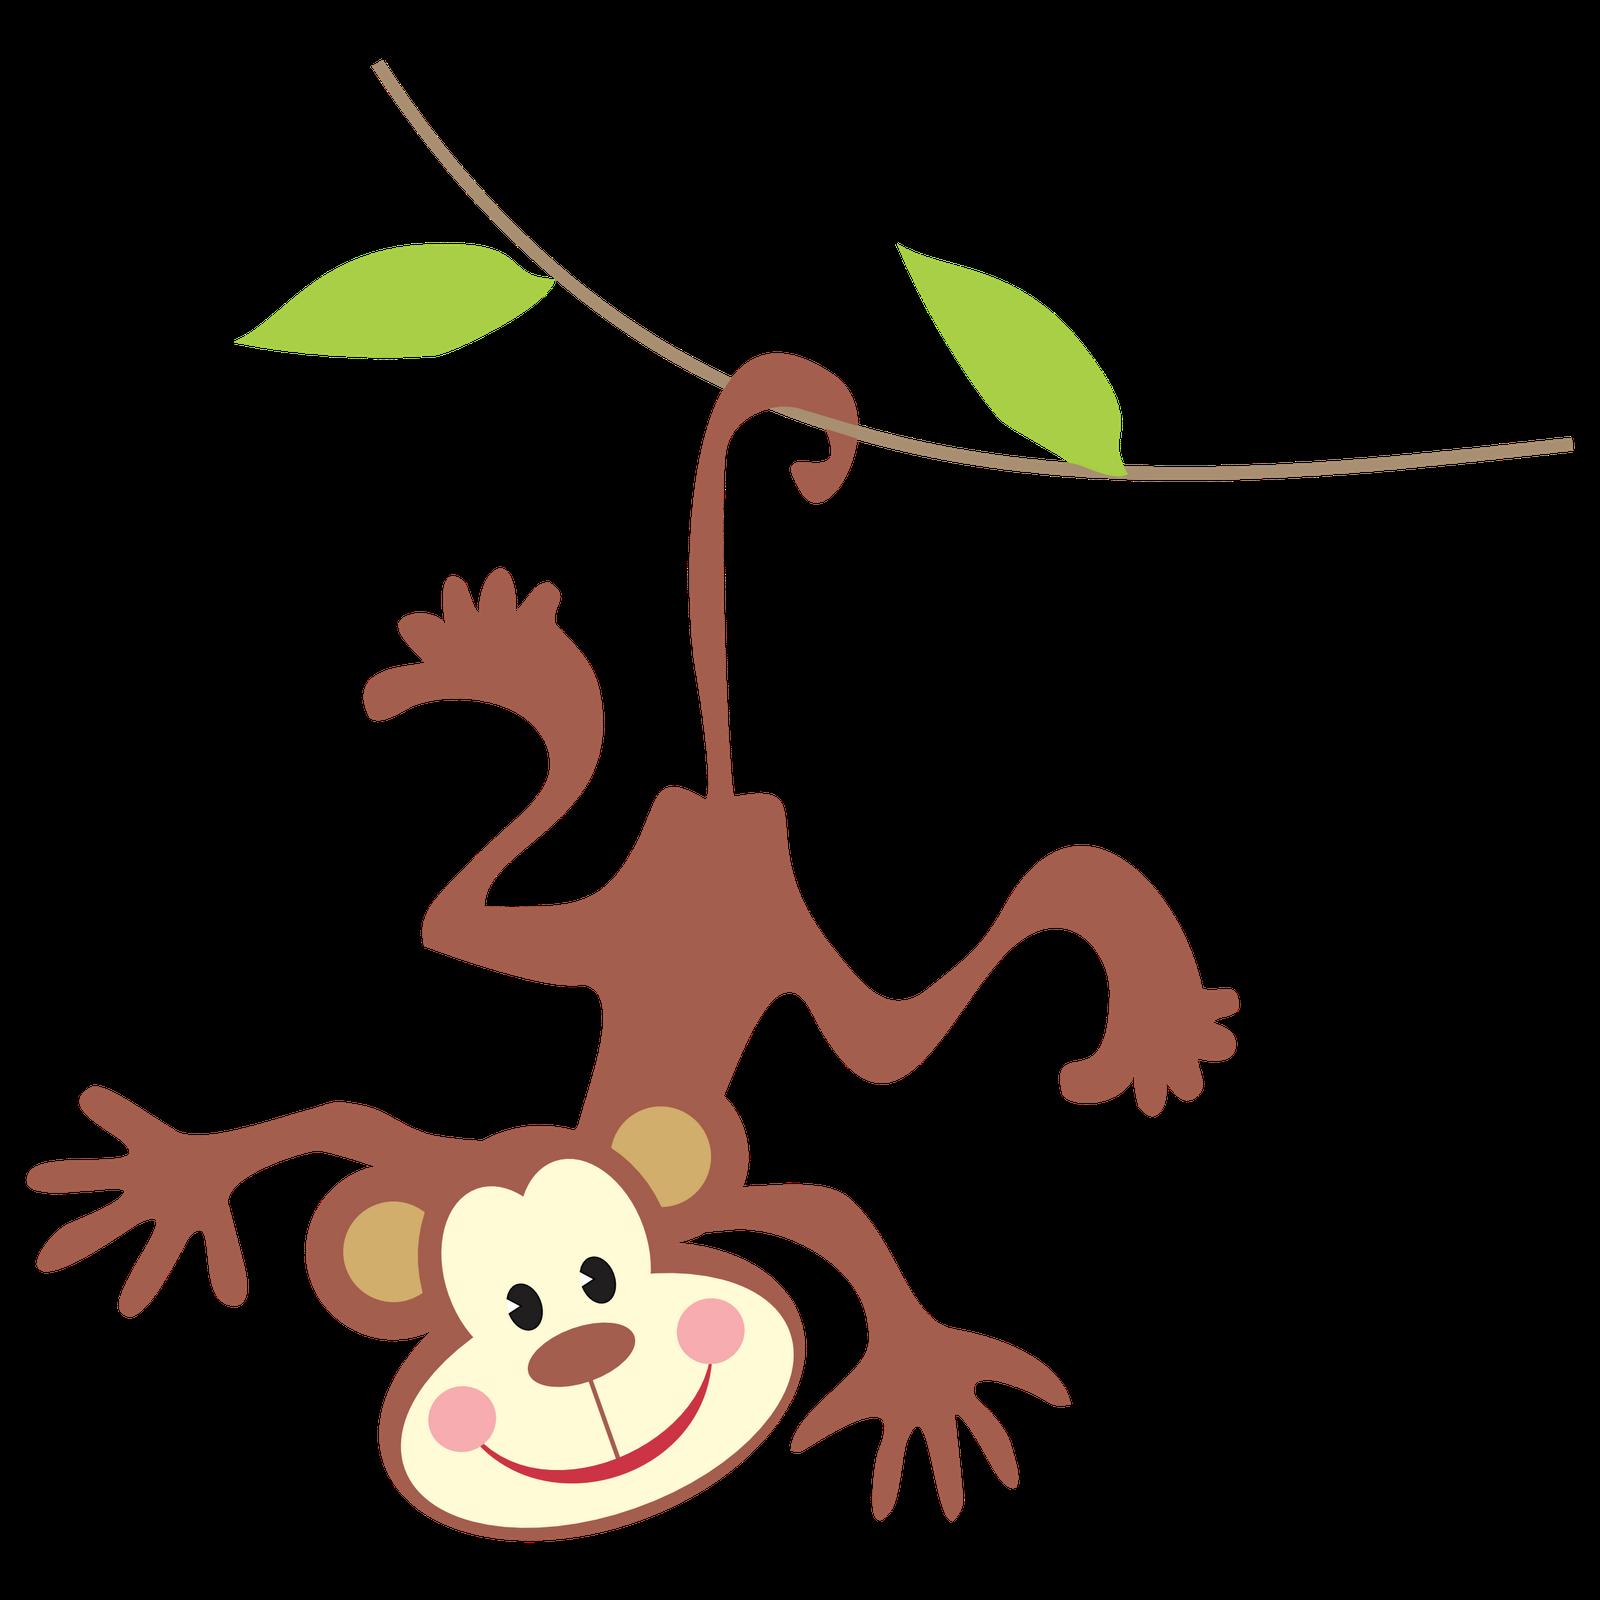 1600x1600 Monkey Clipart Monkey Animal Clip Art Monkey Photo